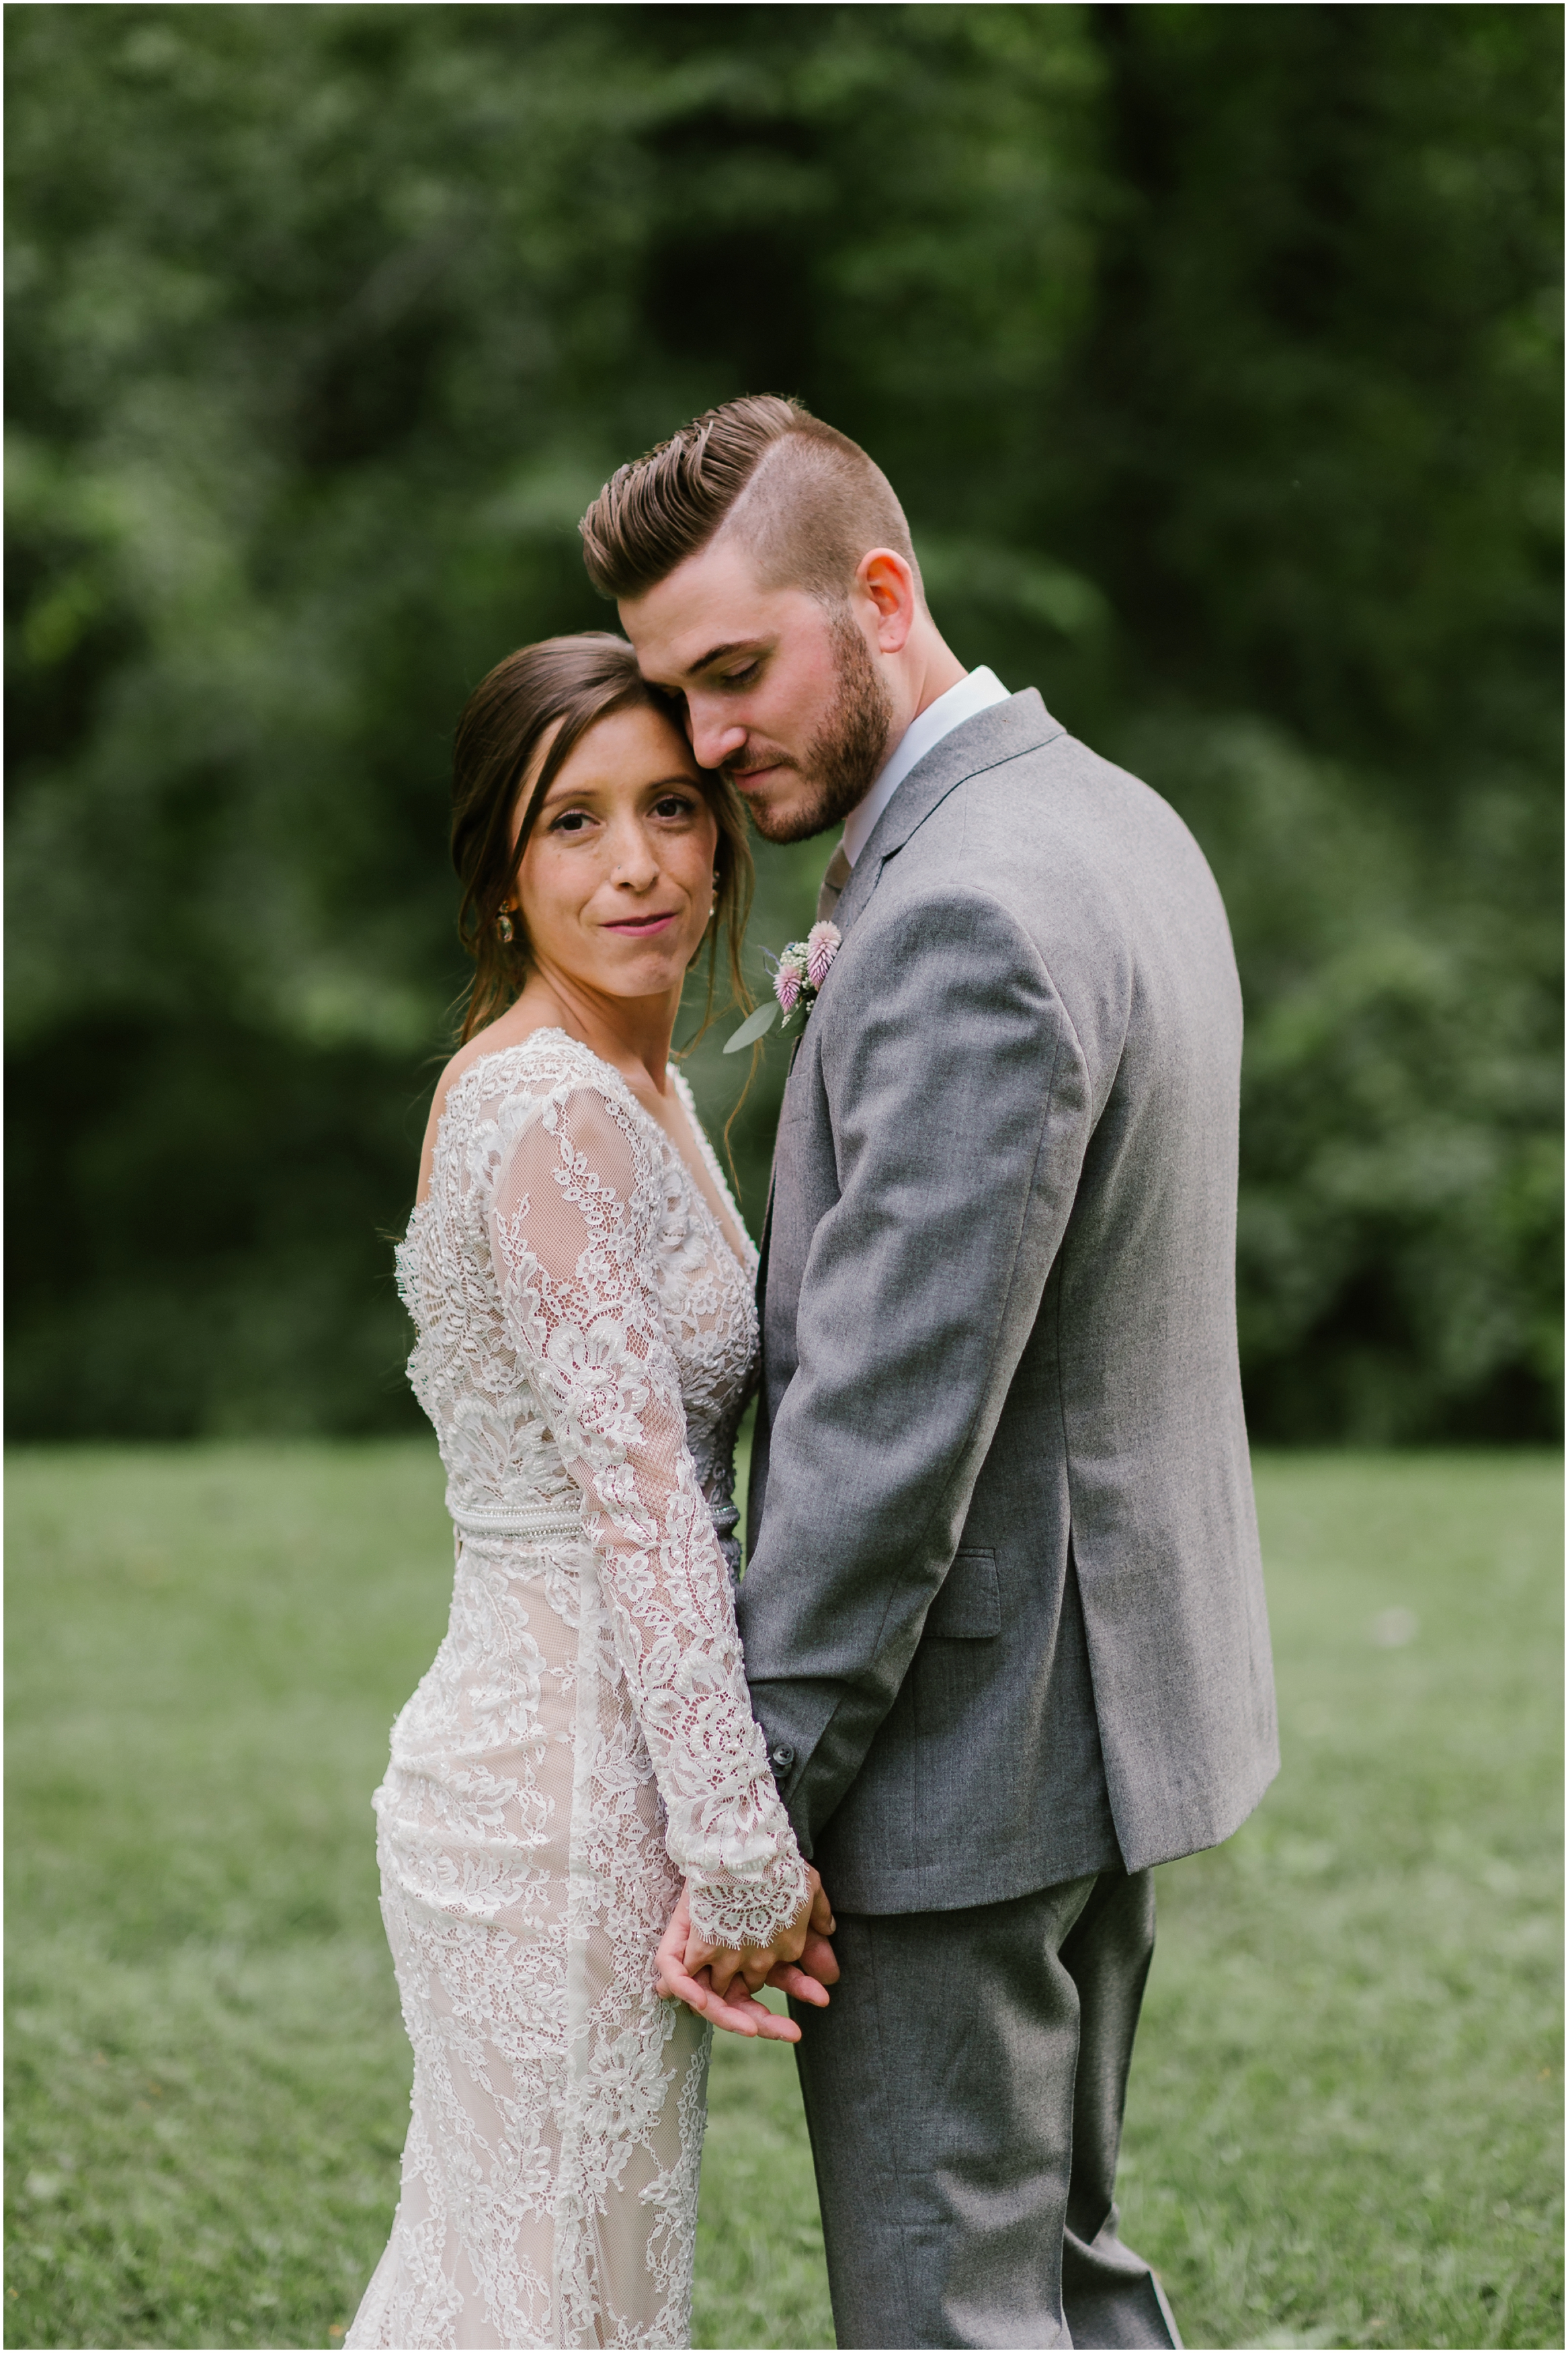 Rebecca_Shehorn_Photography_Indianapolis_Wedding_Photographer_9308.jpg